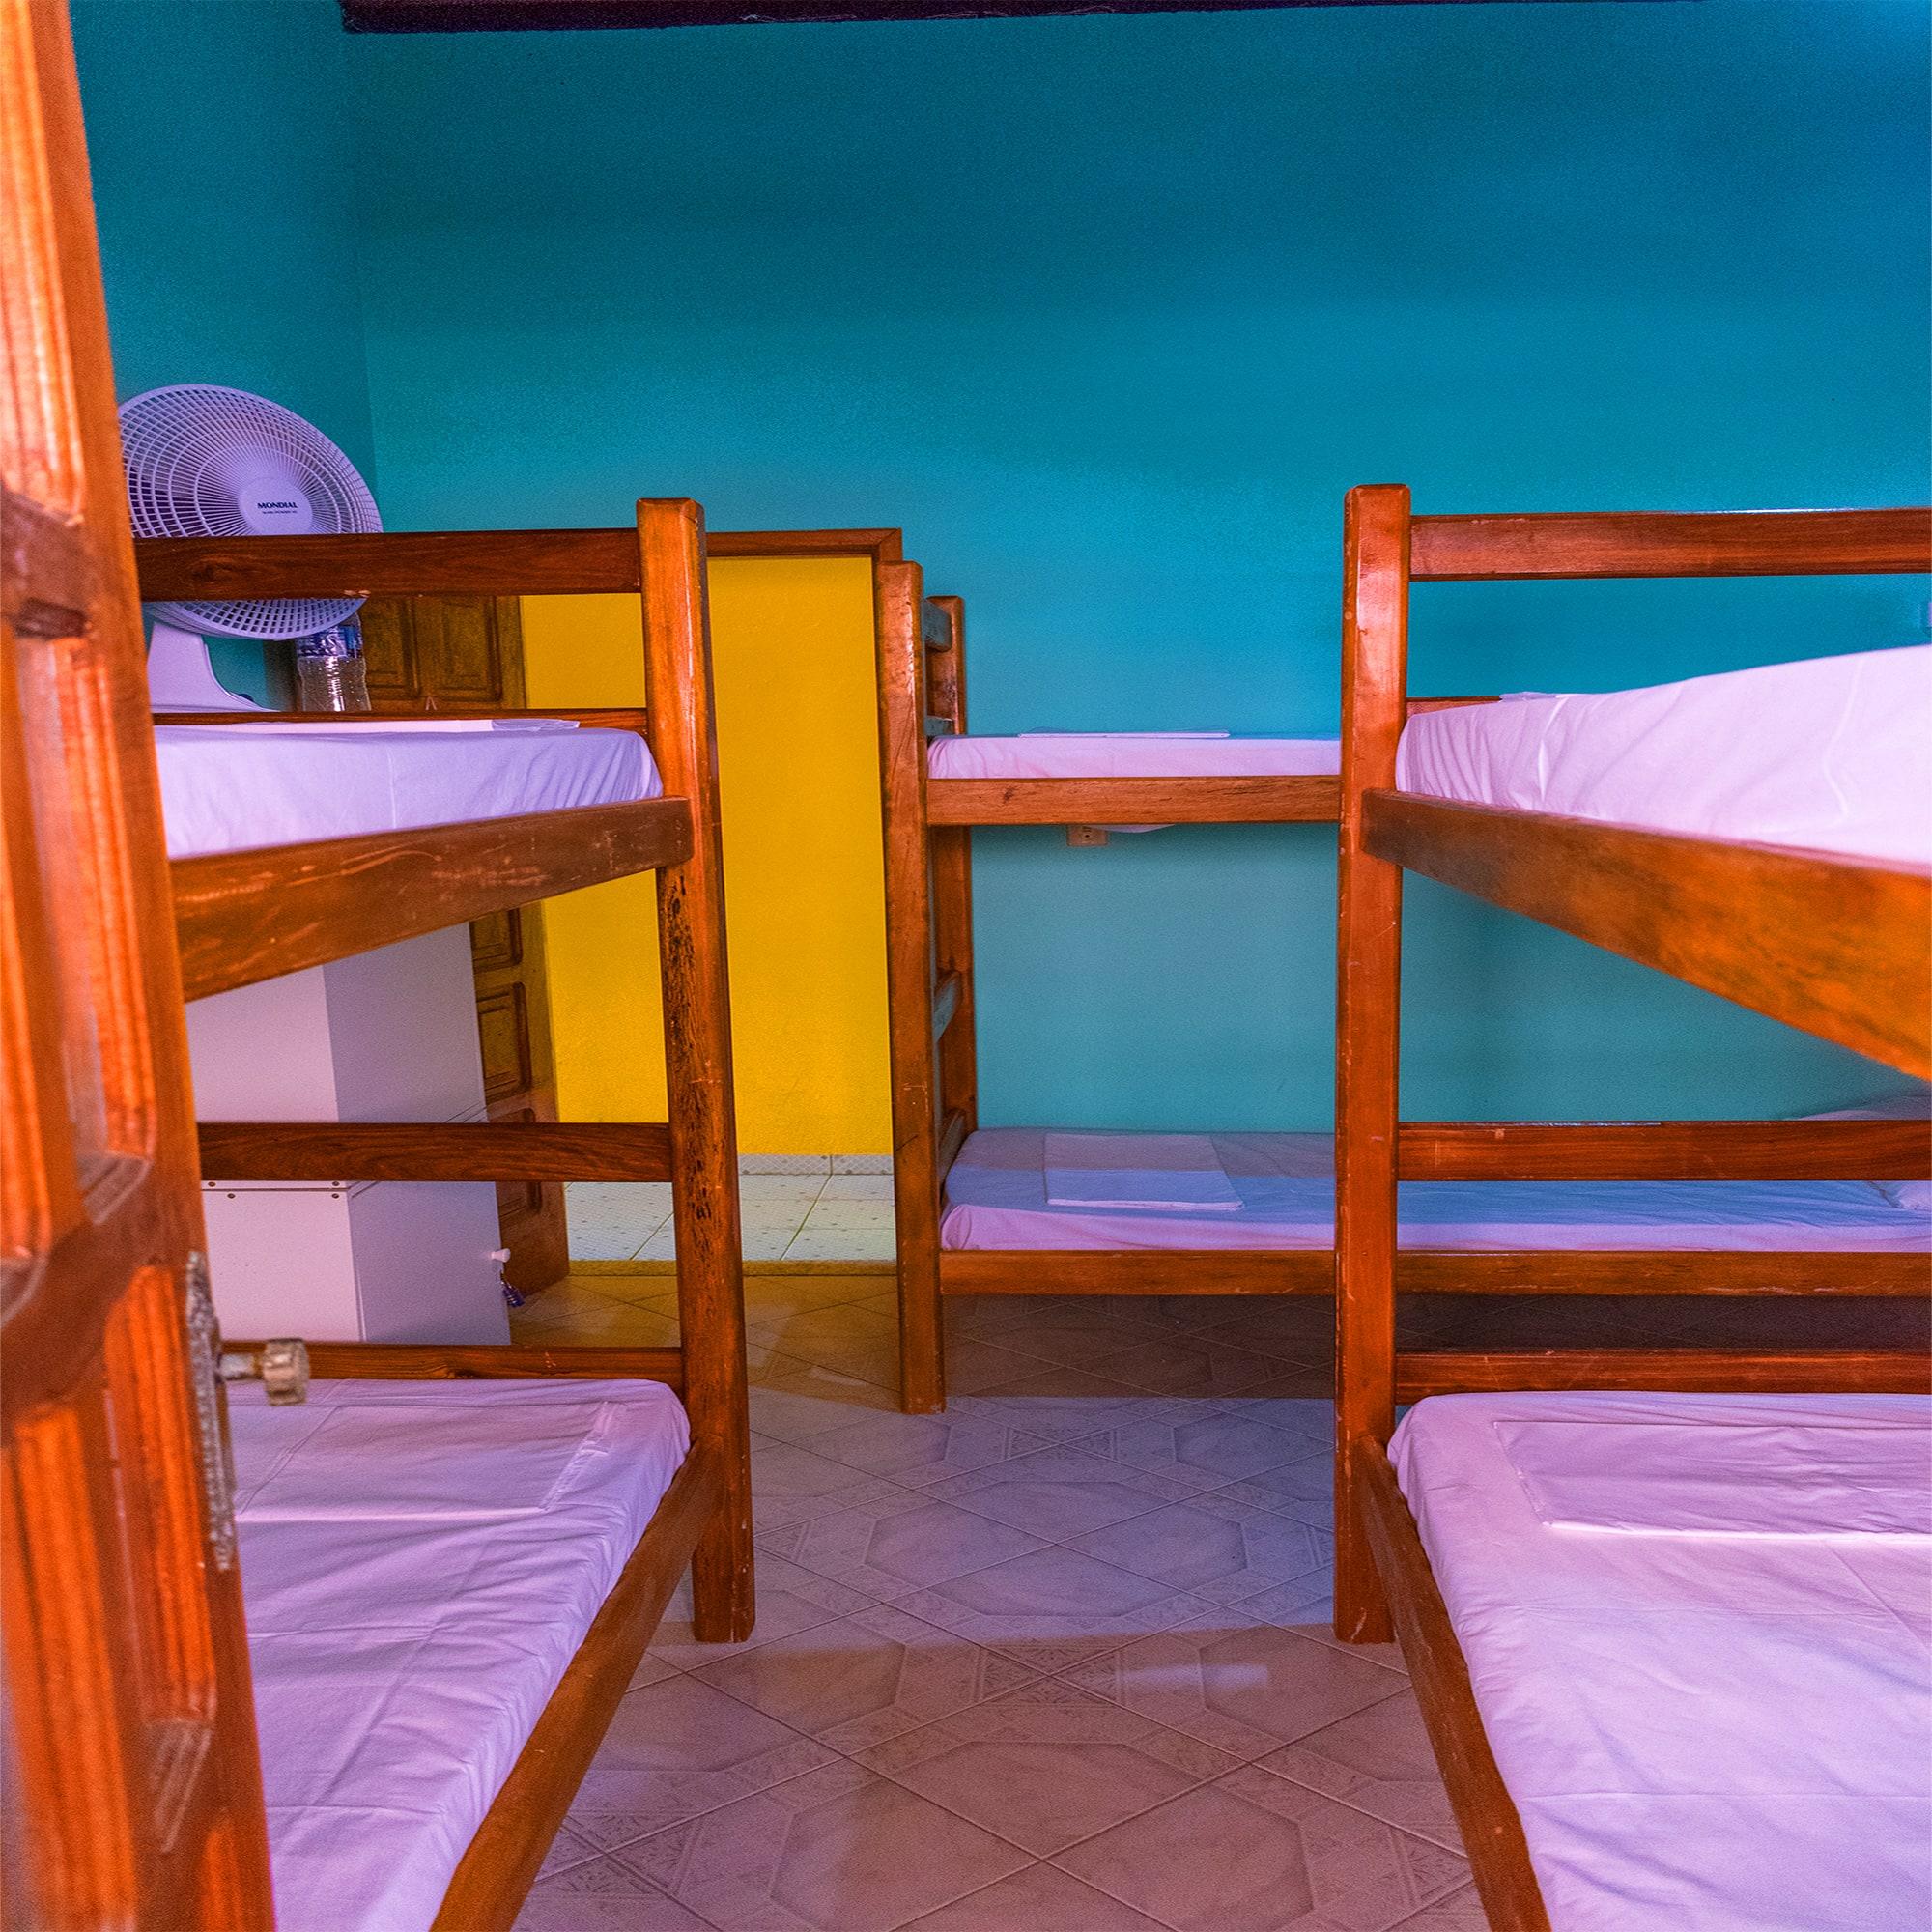 The Hostel Paulista